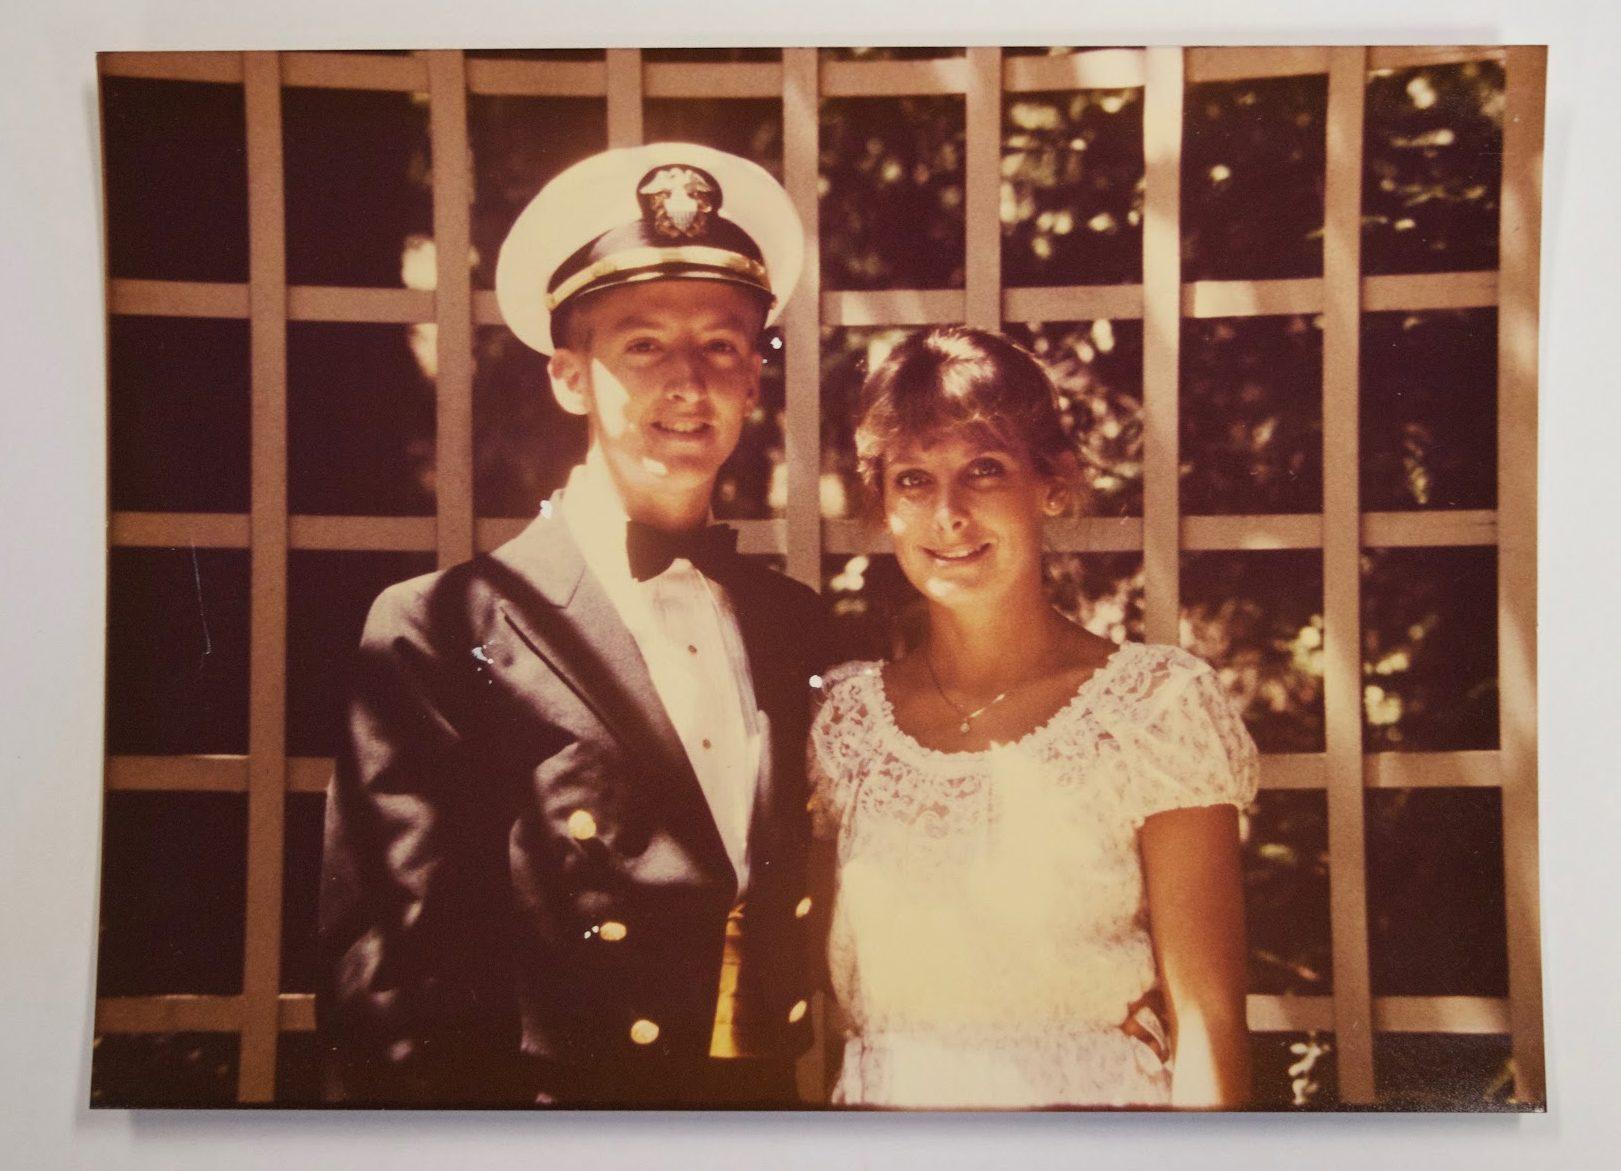 Auburn 1980 graduates Jim and Jan Holt met on the Plains.